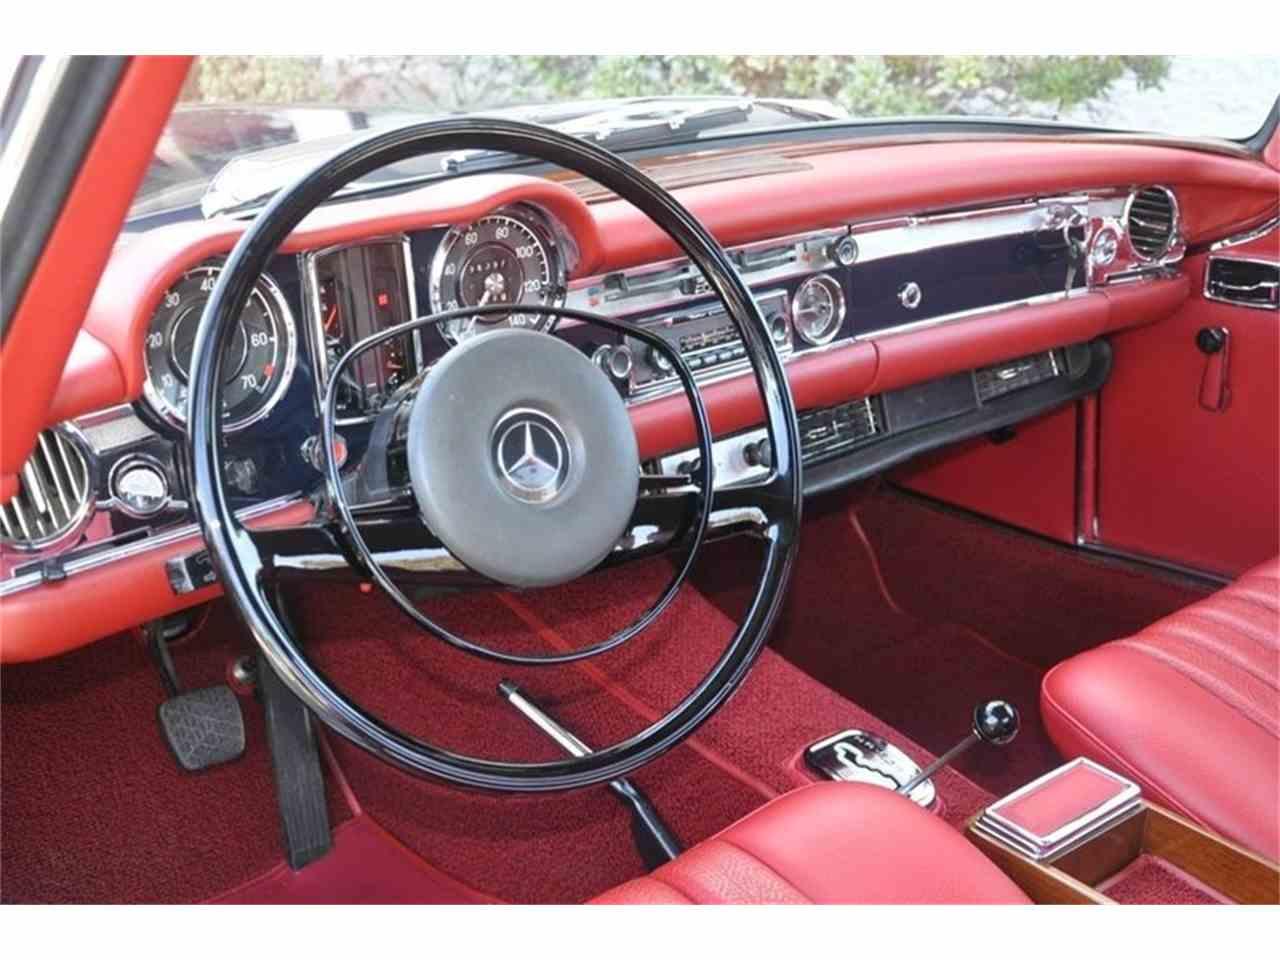 Large Picture of Classic '69 Mercedes-Benz 280SL located in California - JFPJ